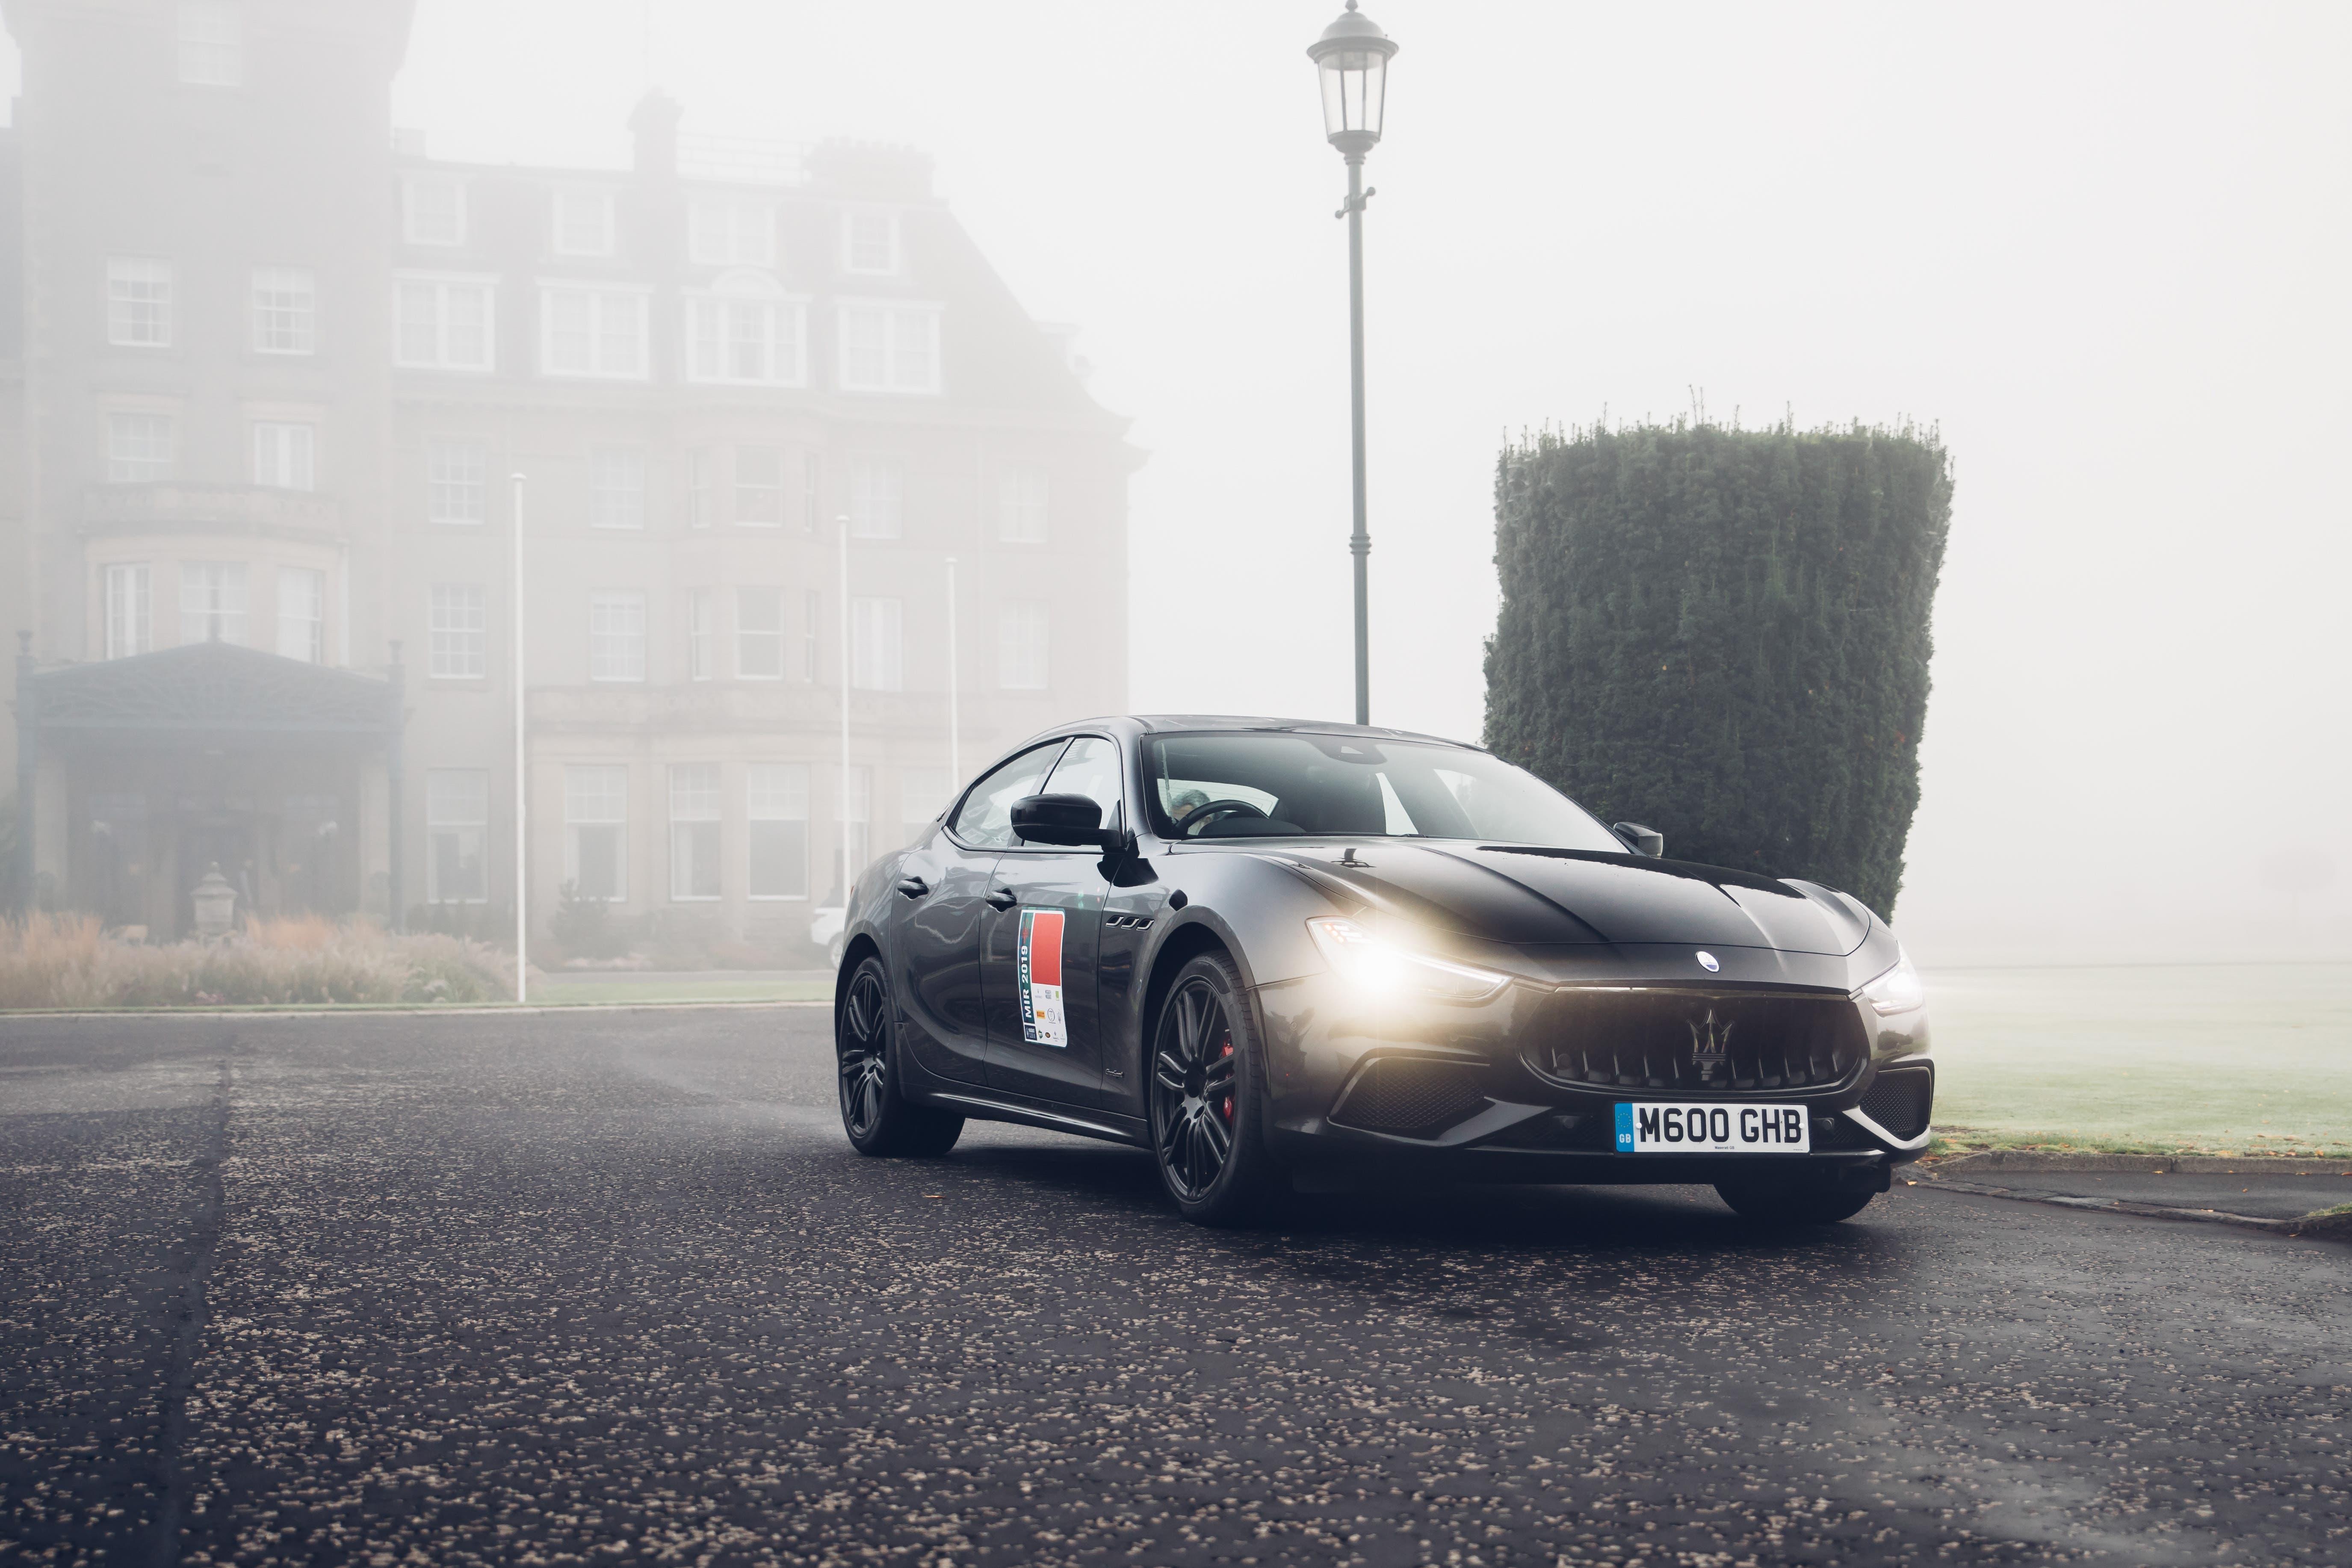 Maserati Ghibli MIR 2019